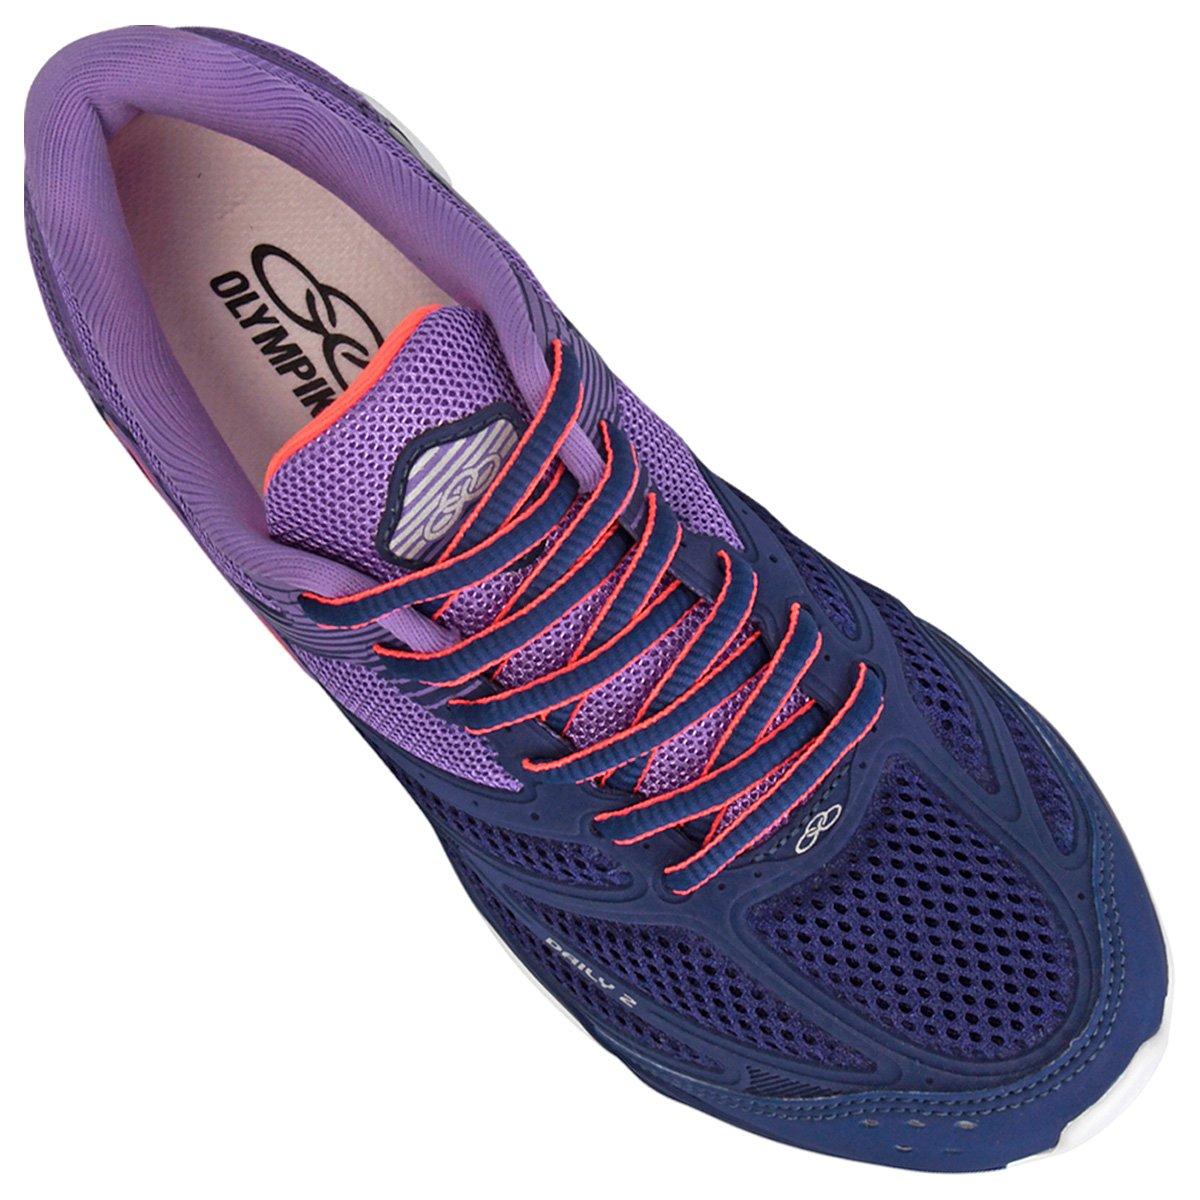 320cec56bb Tênis Olympikus Daily 2 Feminino - Compre Agora